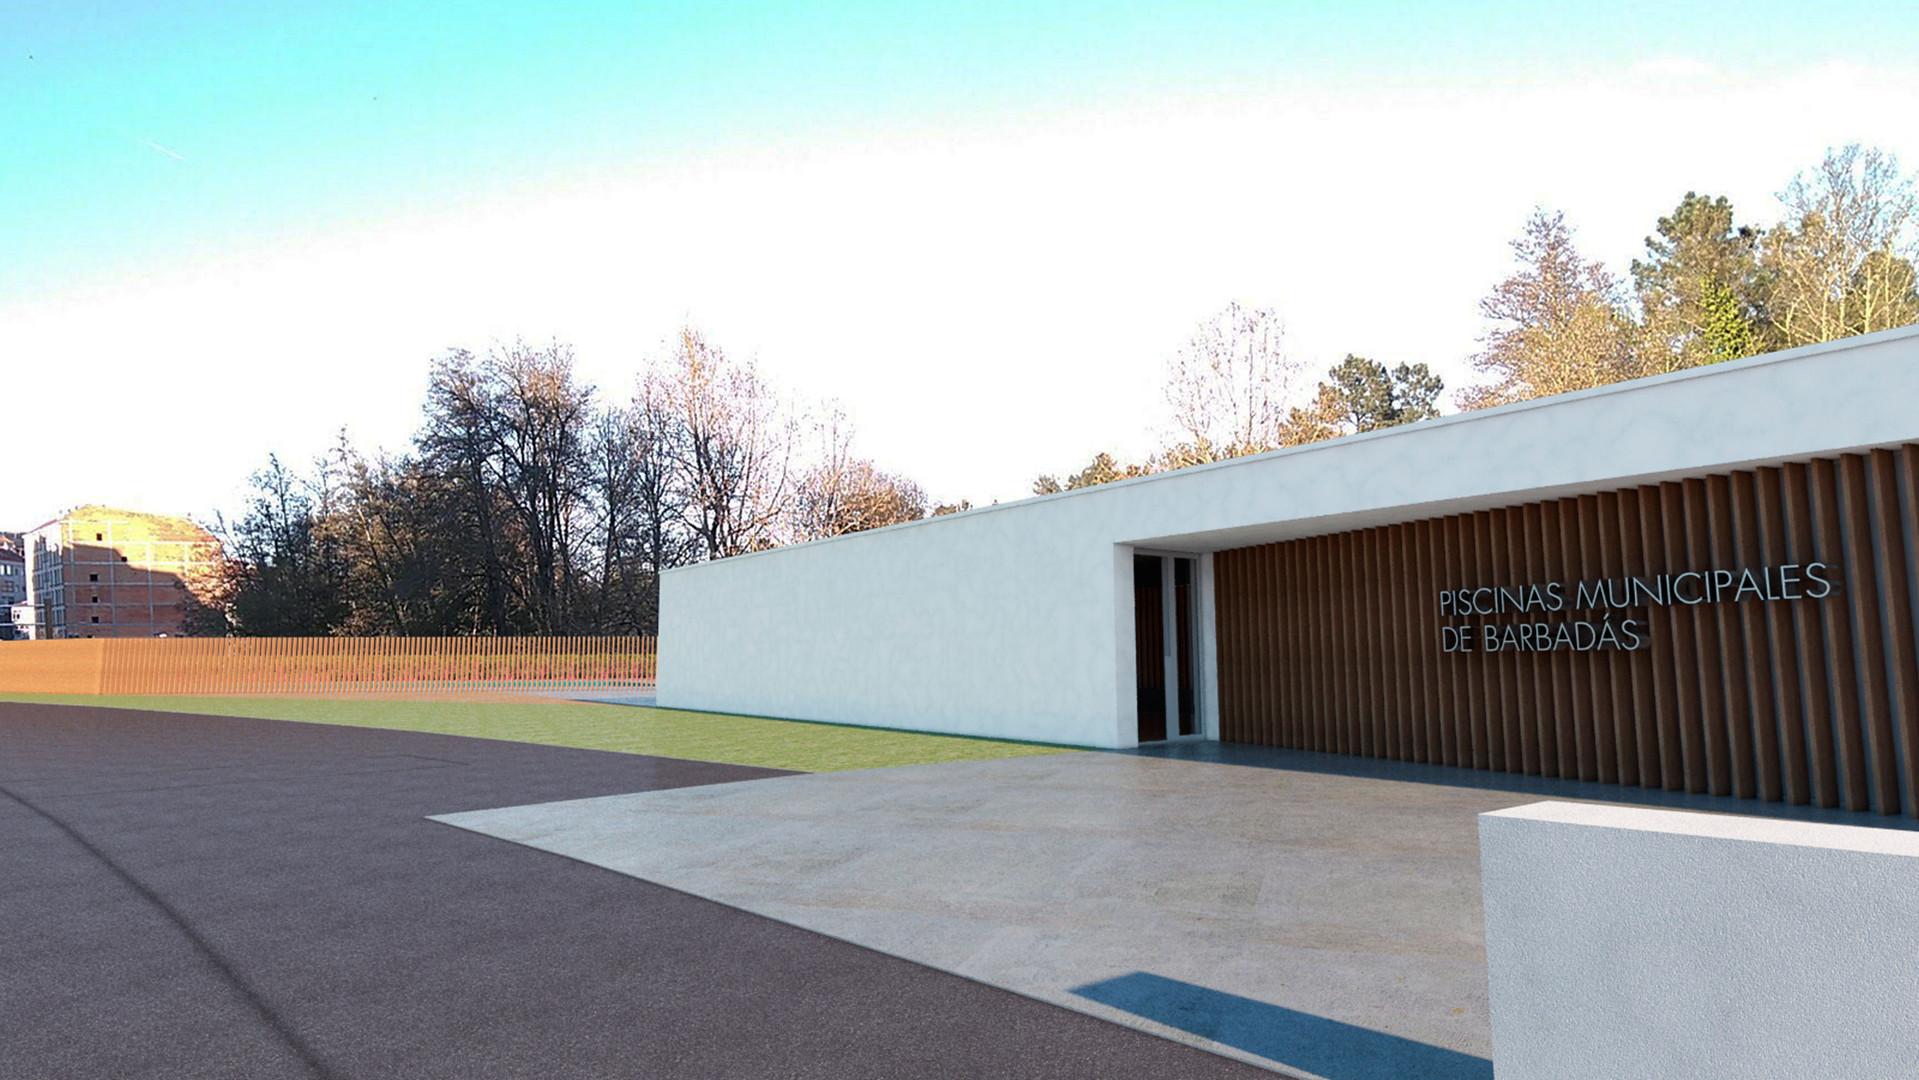 arquitectura-senmais-19.11.01.jpg